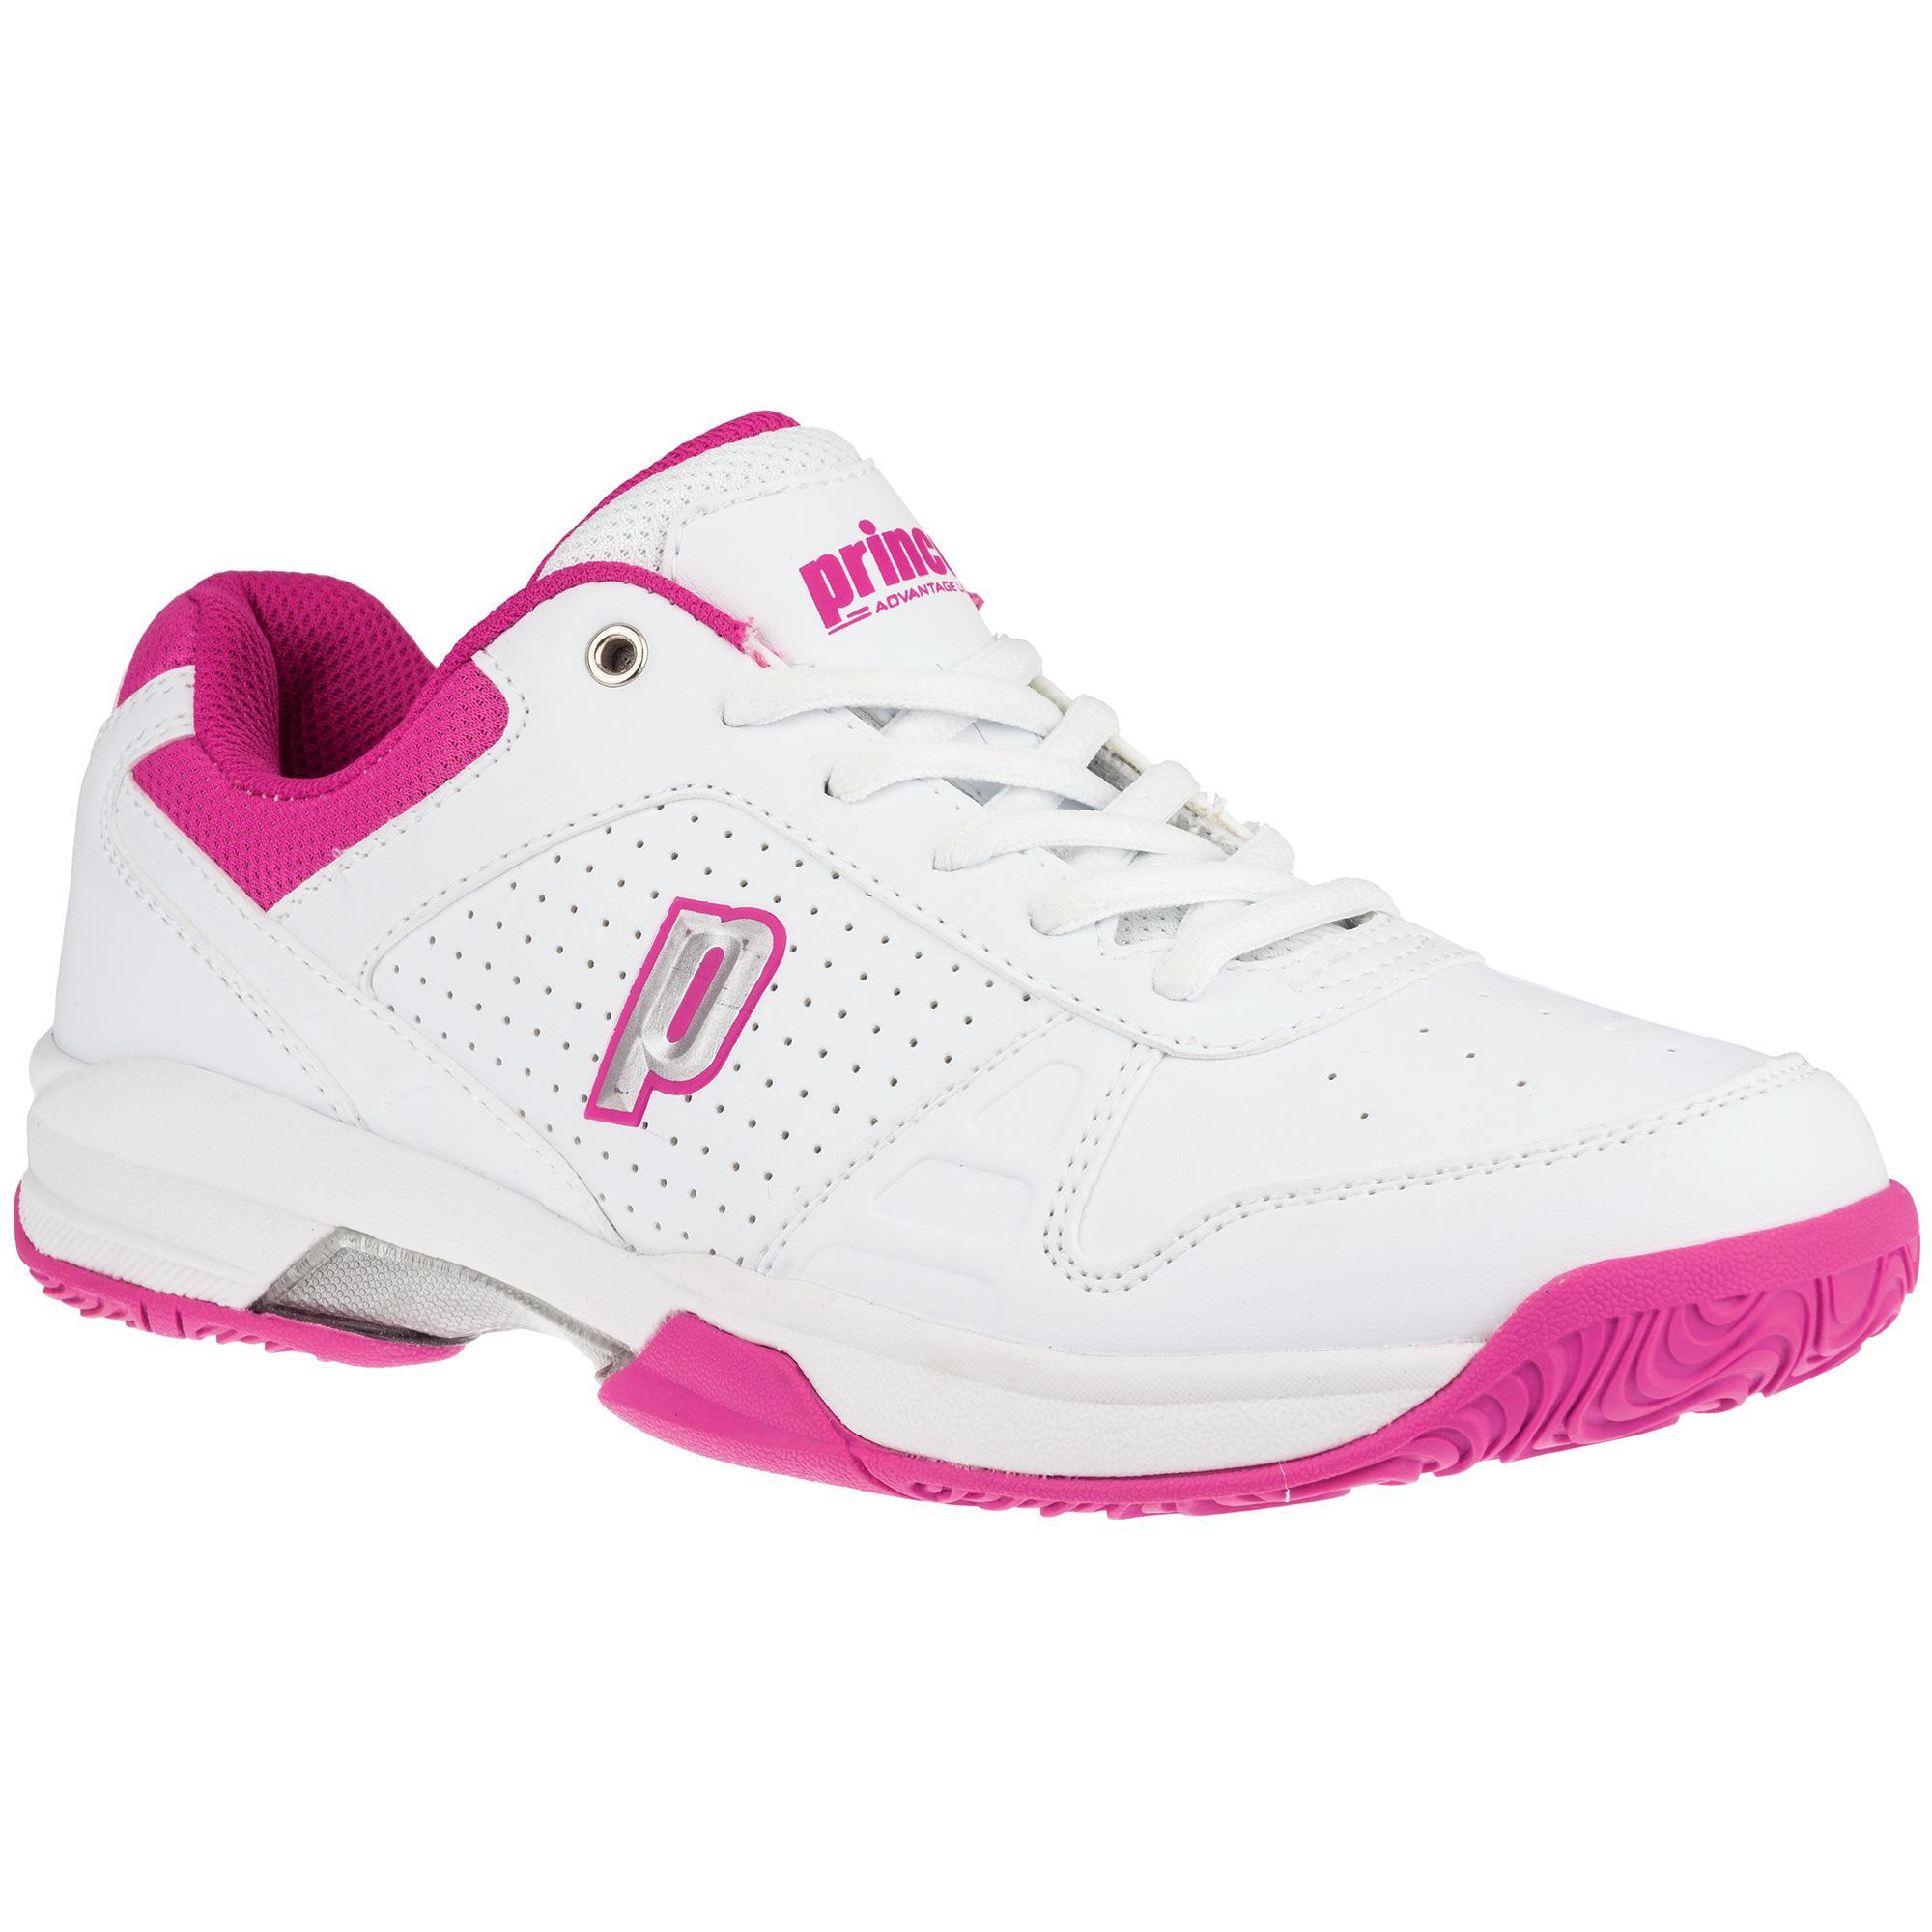 Prince Tennis Shoes Womens